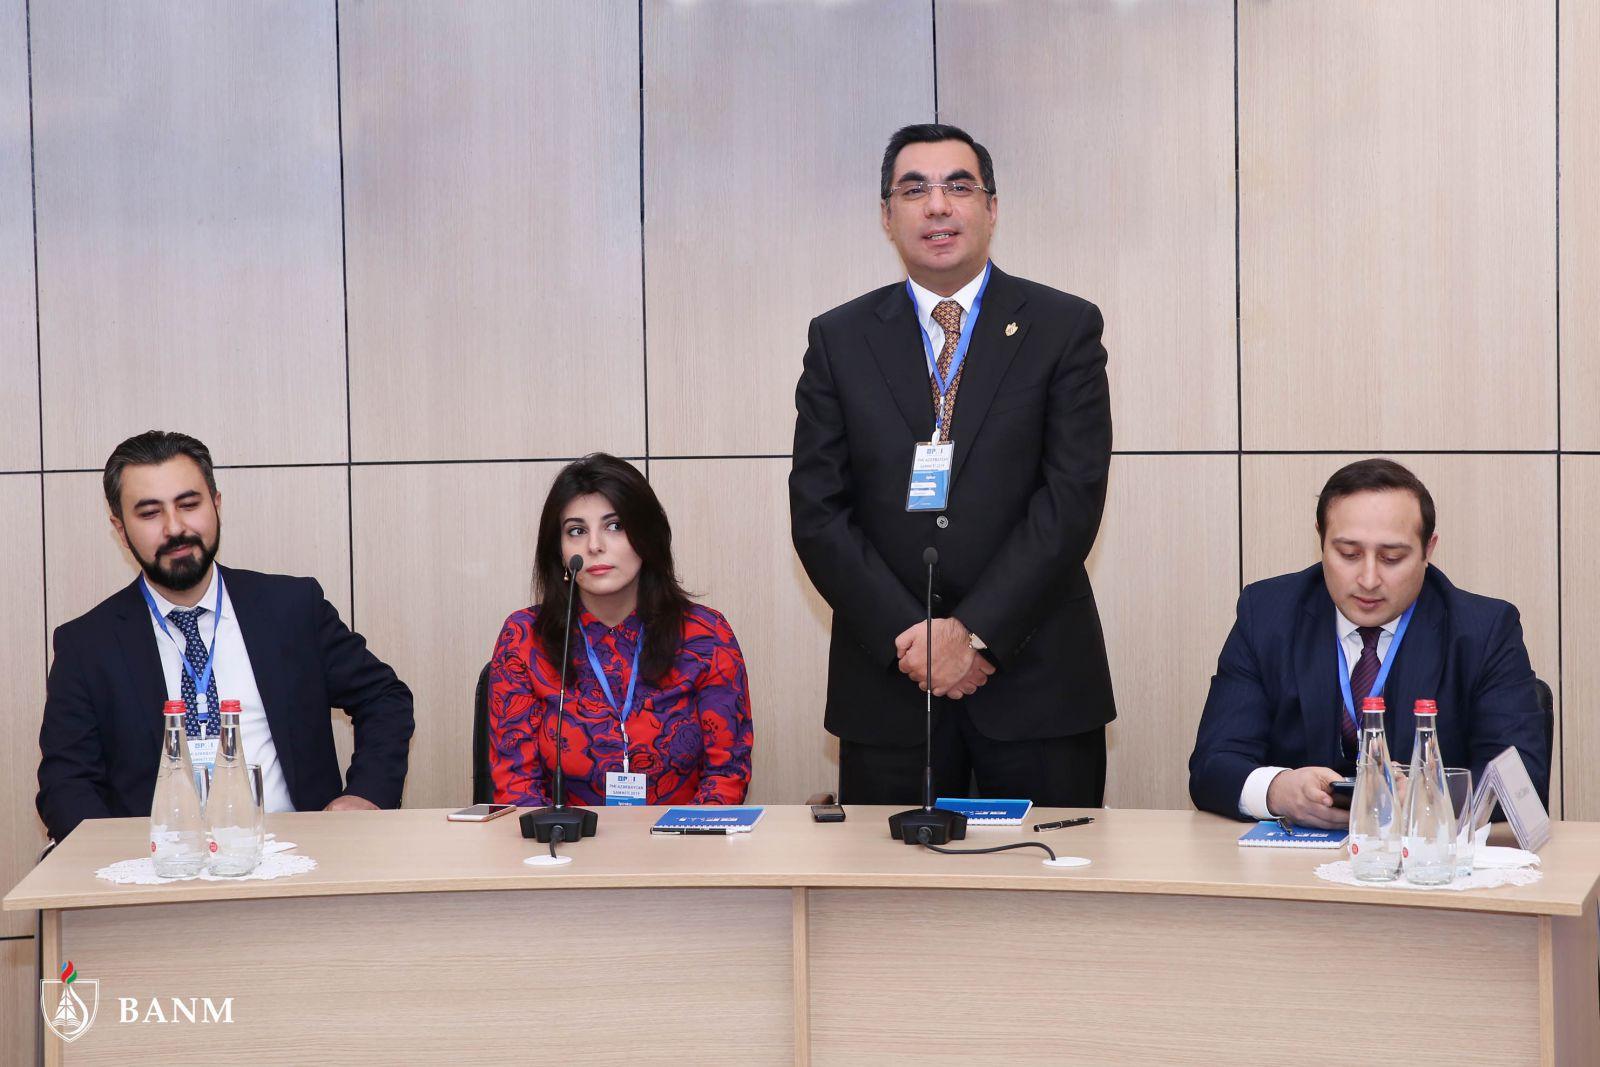 Bhos Pmi Azerbaijan Summit 2019 Was Held At Baku Higher Oil School